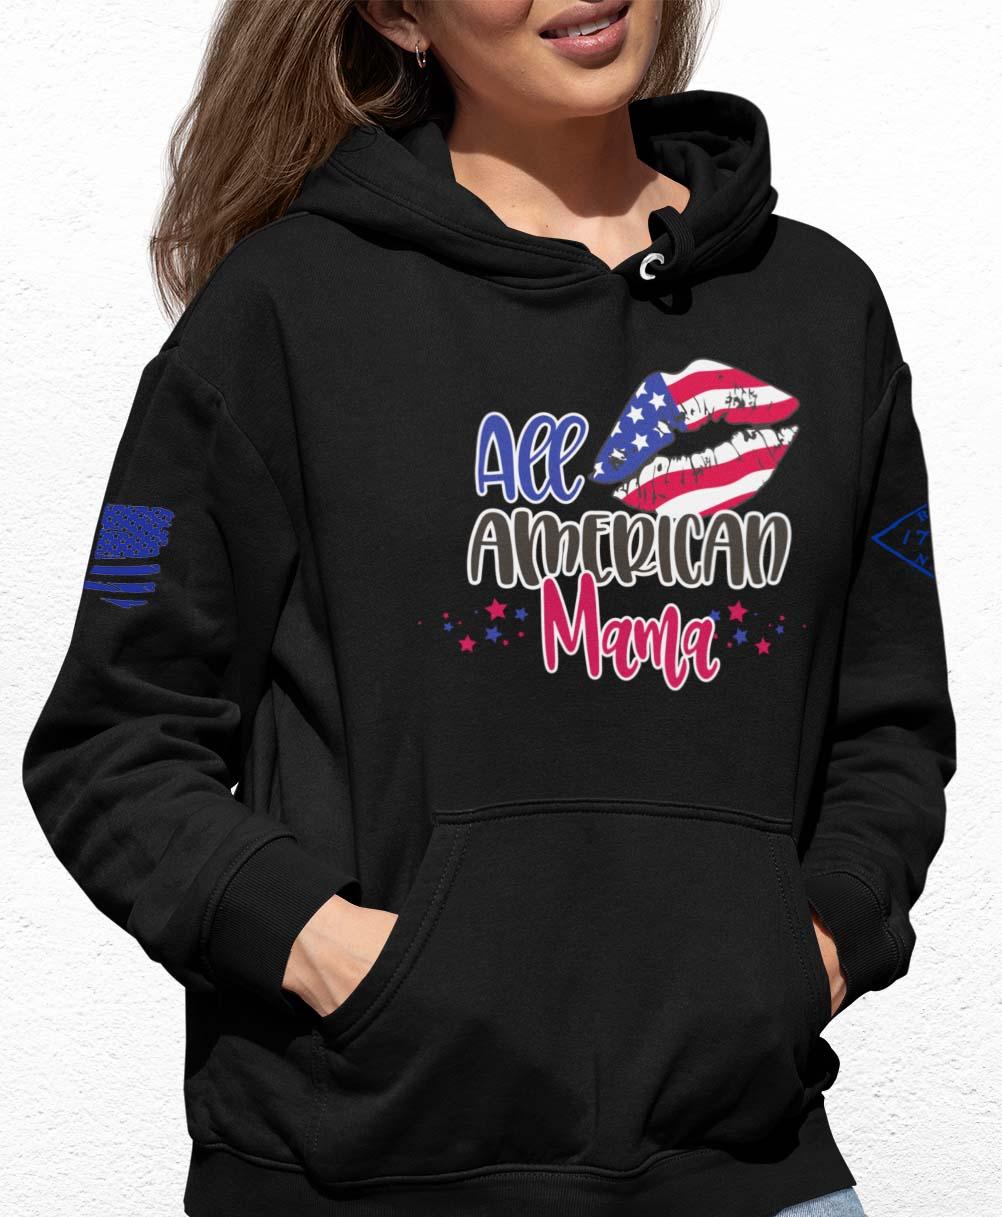 All American Mama on a Black hoodie